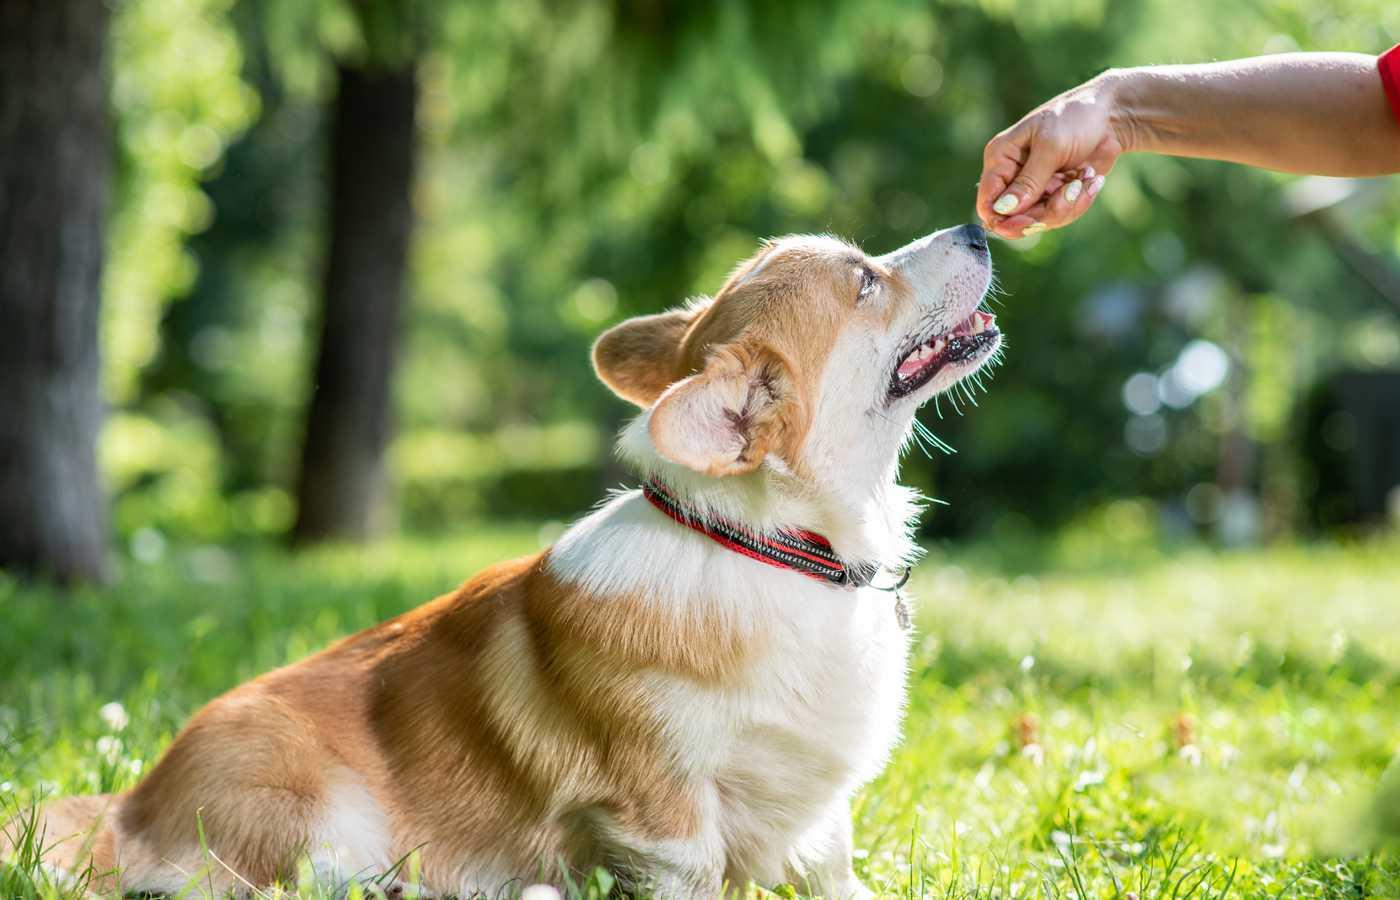 corgi puppy pet dog struggles